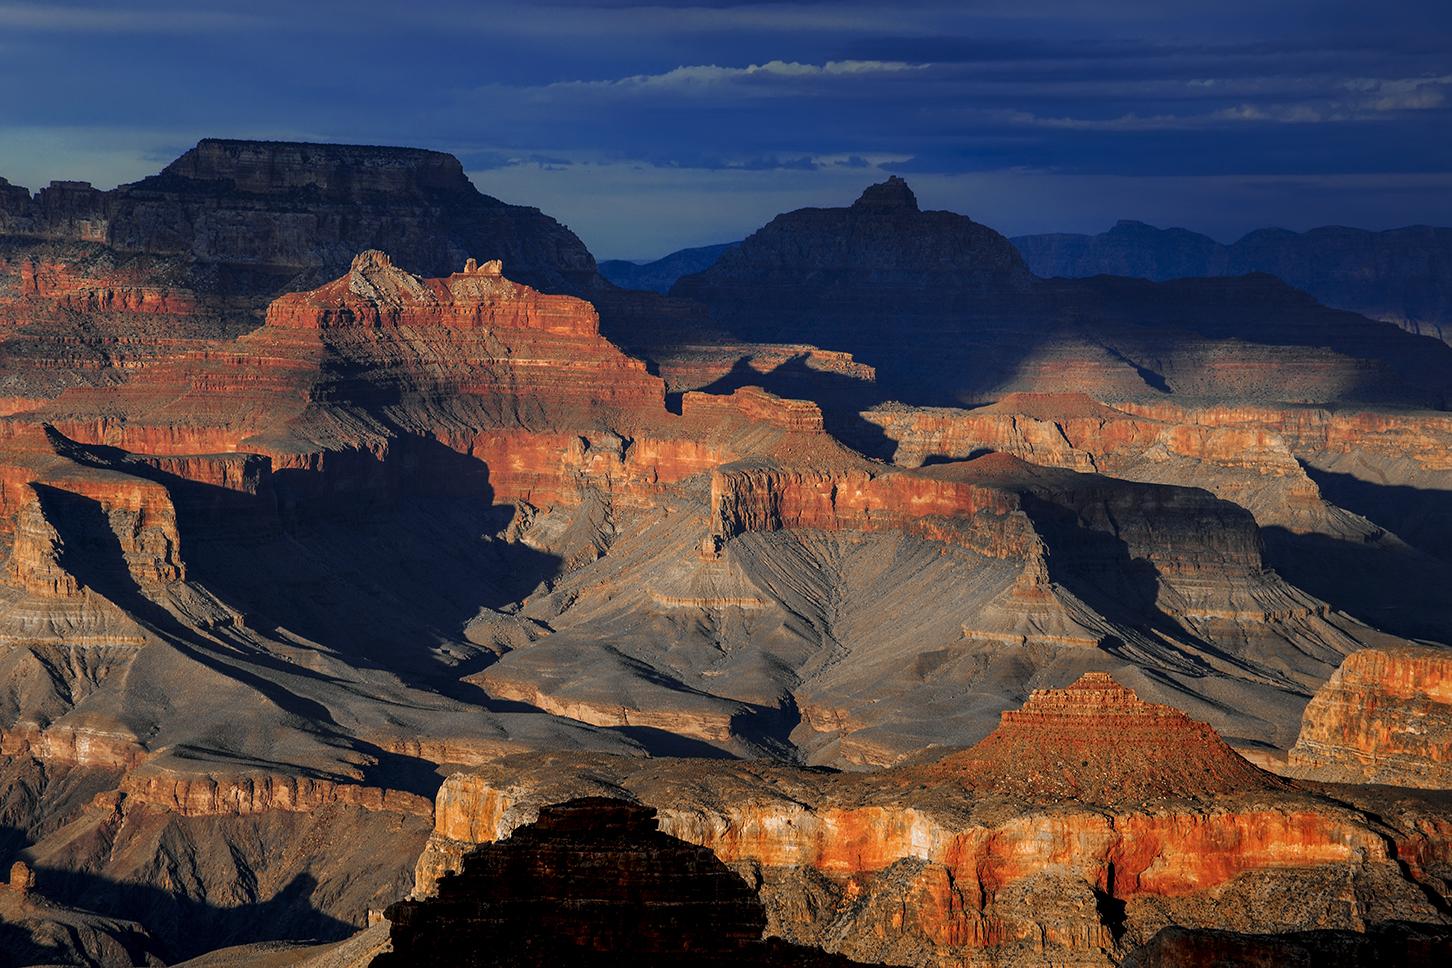 Ethereal Canyon